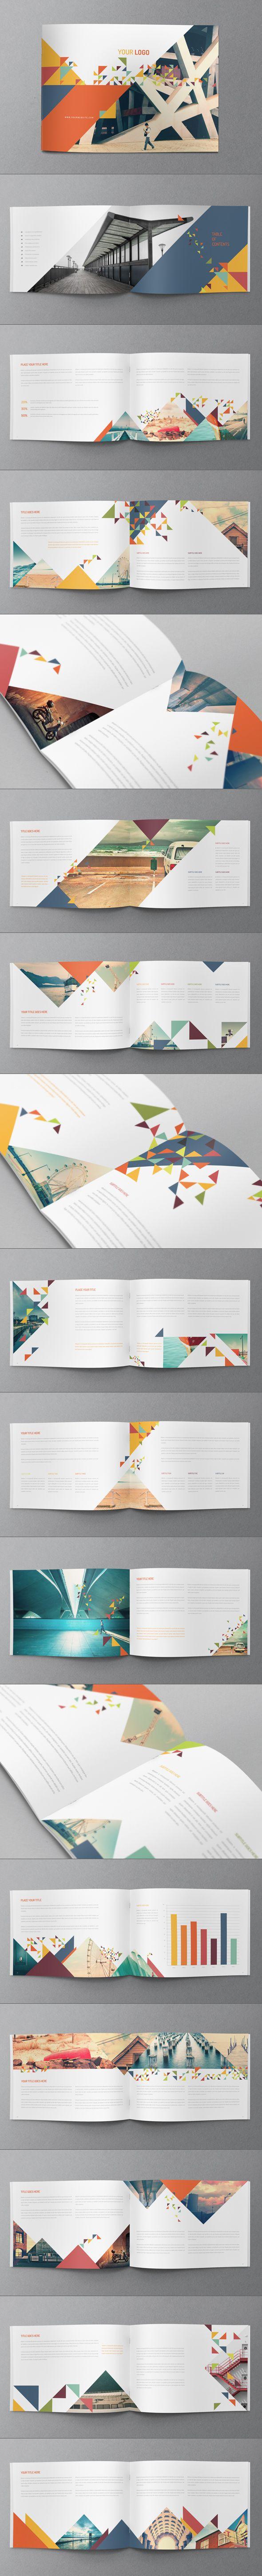 Colorful Modern Brochure. Download here: http://graphicriver.net/item/colorful-modern-brochure/7675852?ref=abradesign #design #brochure